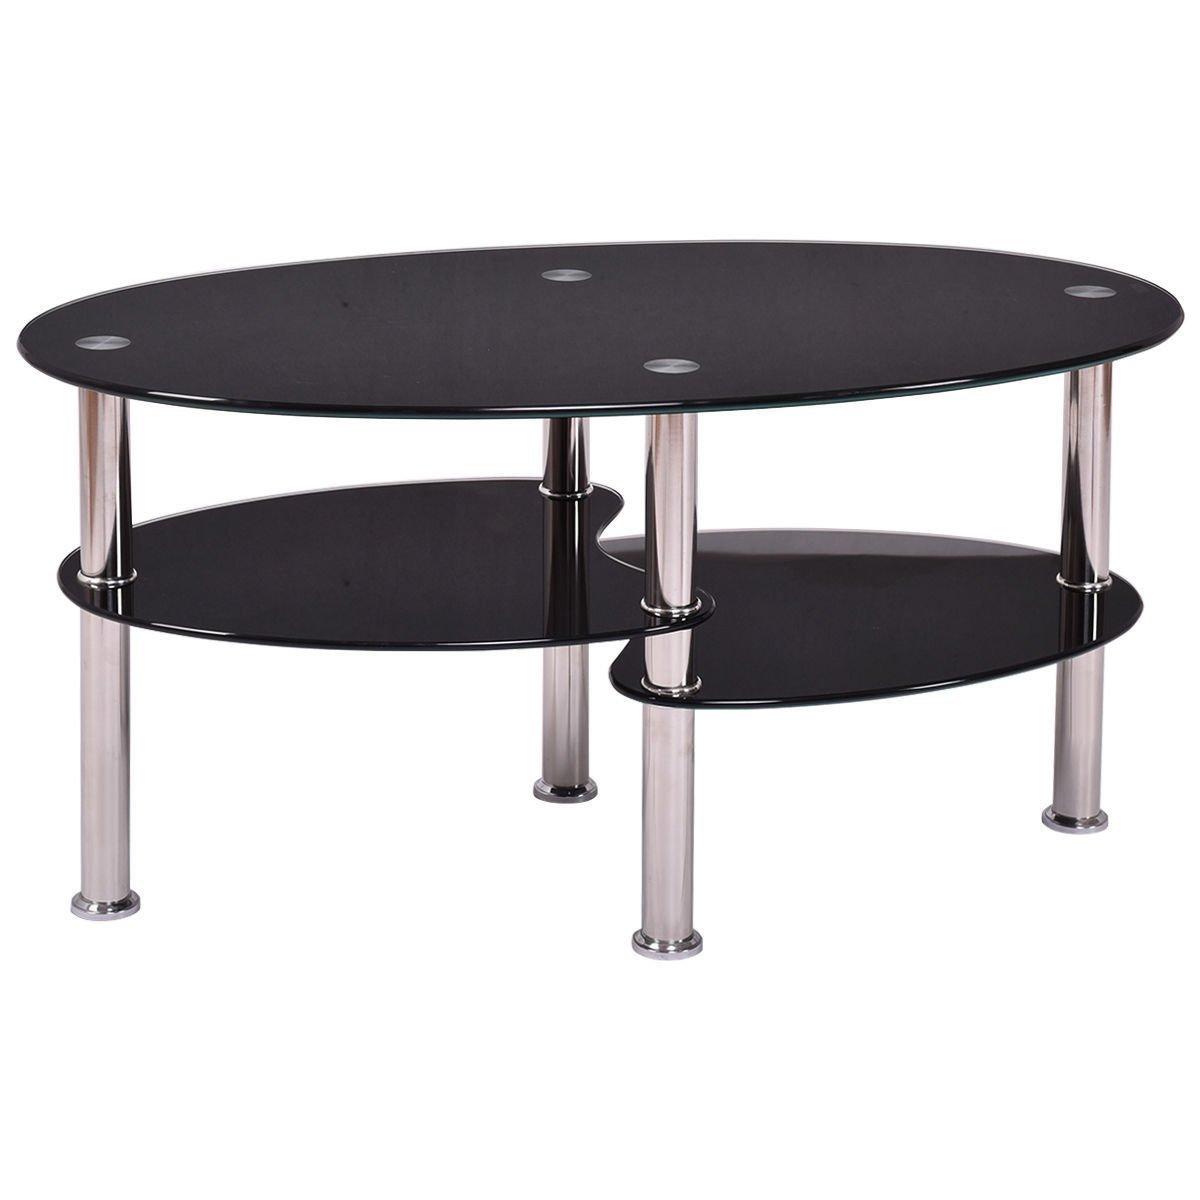 New Black Glass Oval Side Coffee Table Shelf Chrome Base Living Room Furniture 654554640696 Ebay